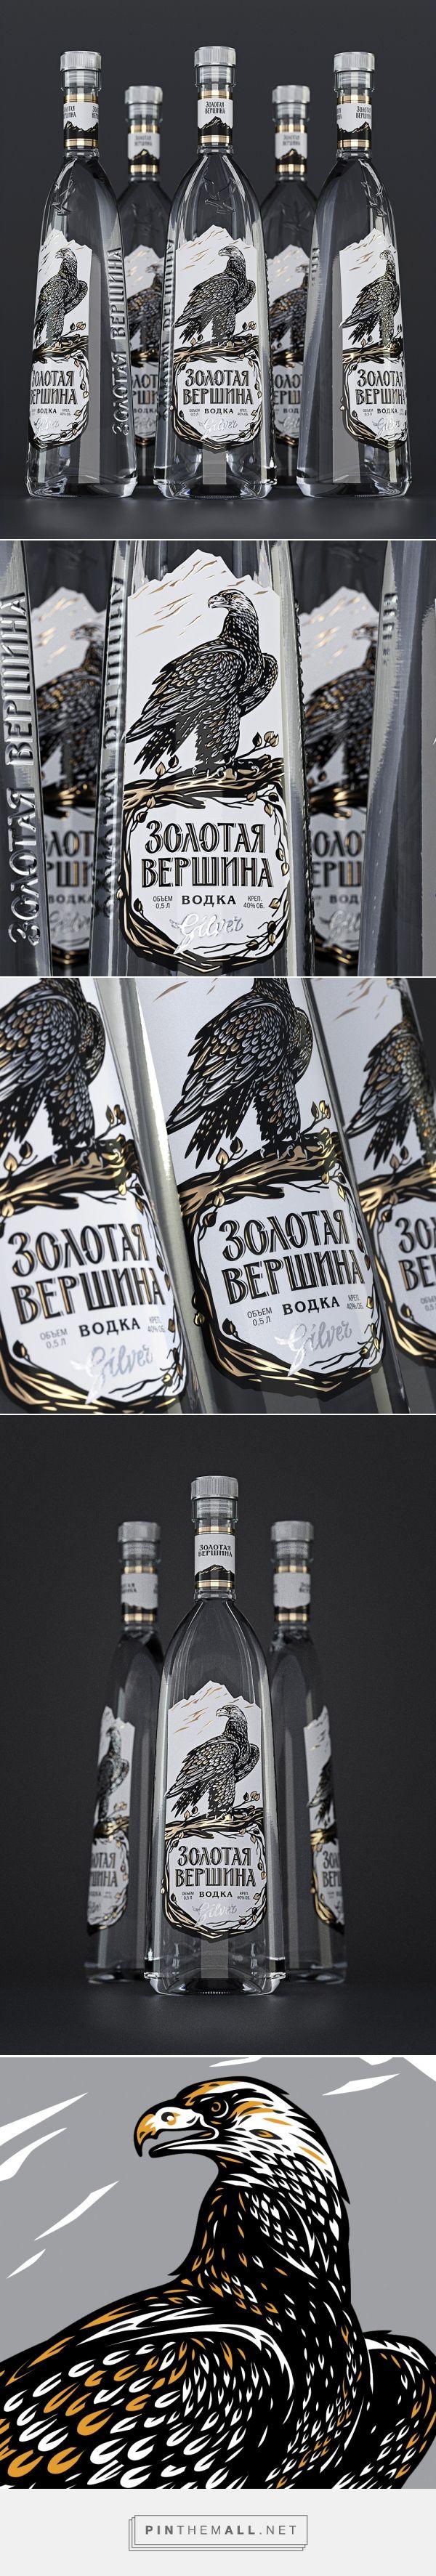 Golden Peak vodka packaging design by Nova Brand - https://www.packagingoftheworld.com/2018/03/golden-peak-zolotaya-vershyna.html